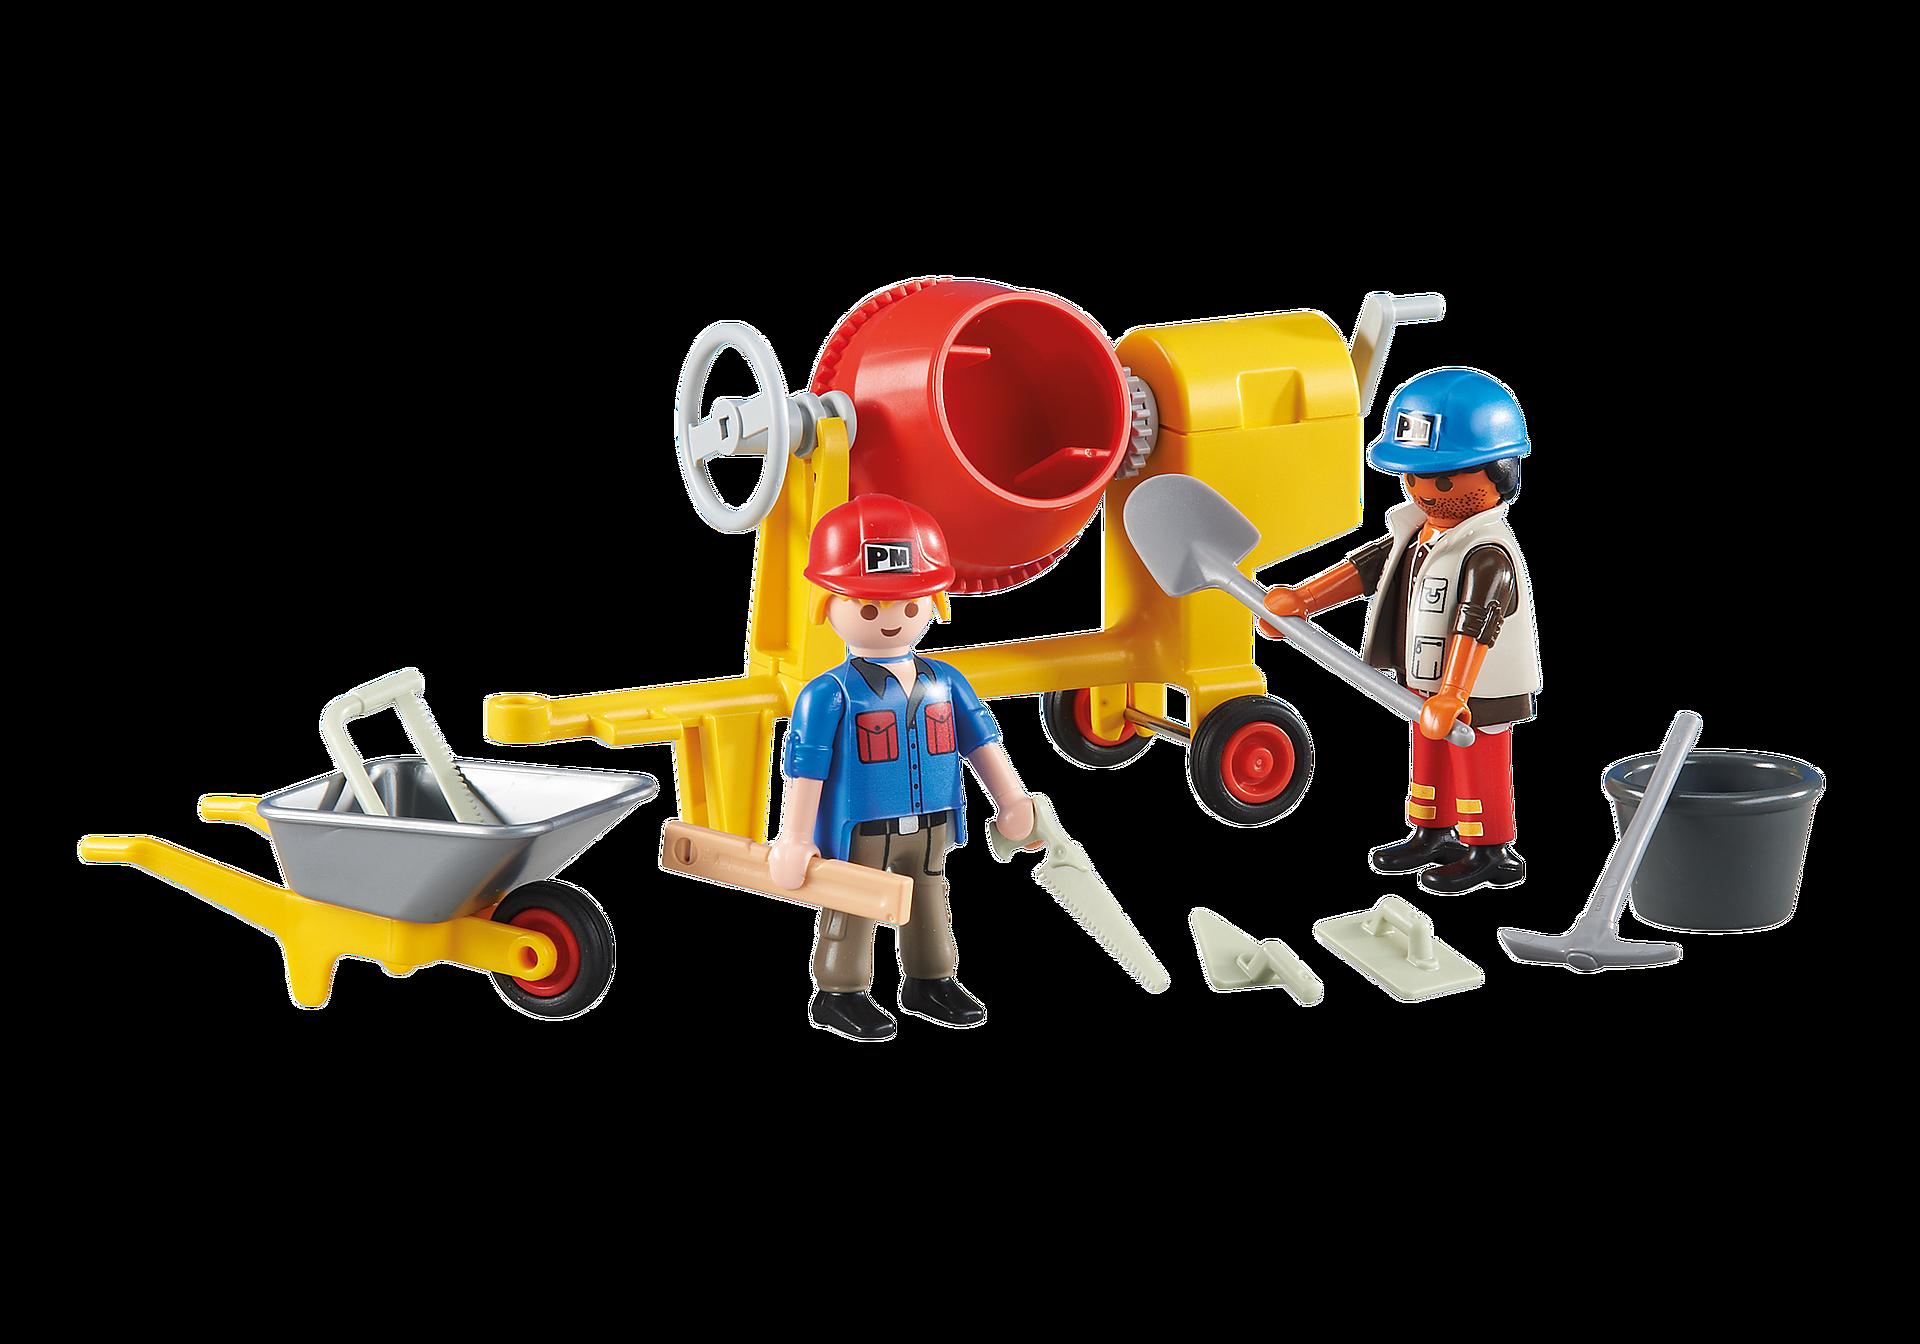 http://media.playmobil.com/i/playmobil/6339_product_detail/Ouvriers avec bétonnière